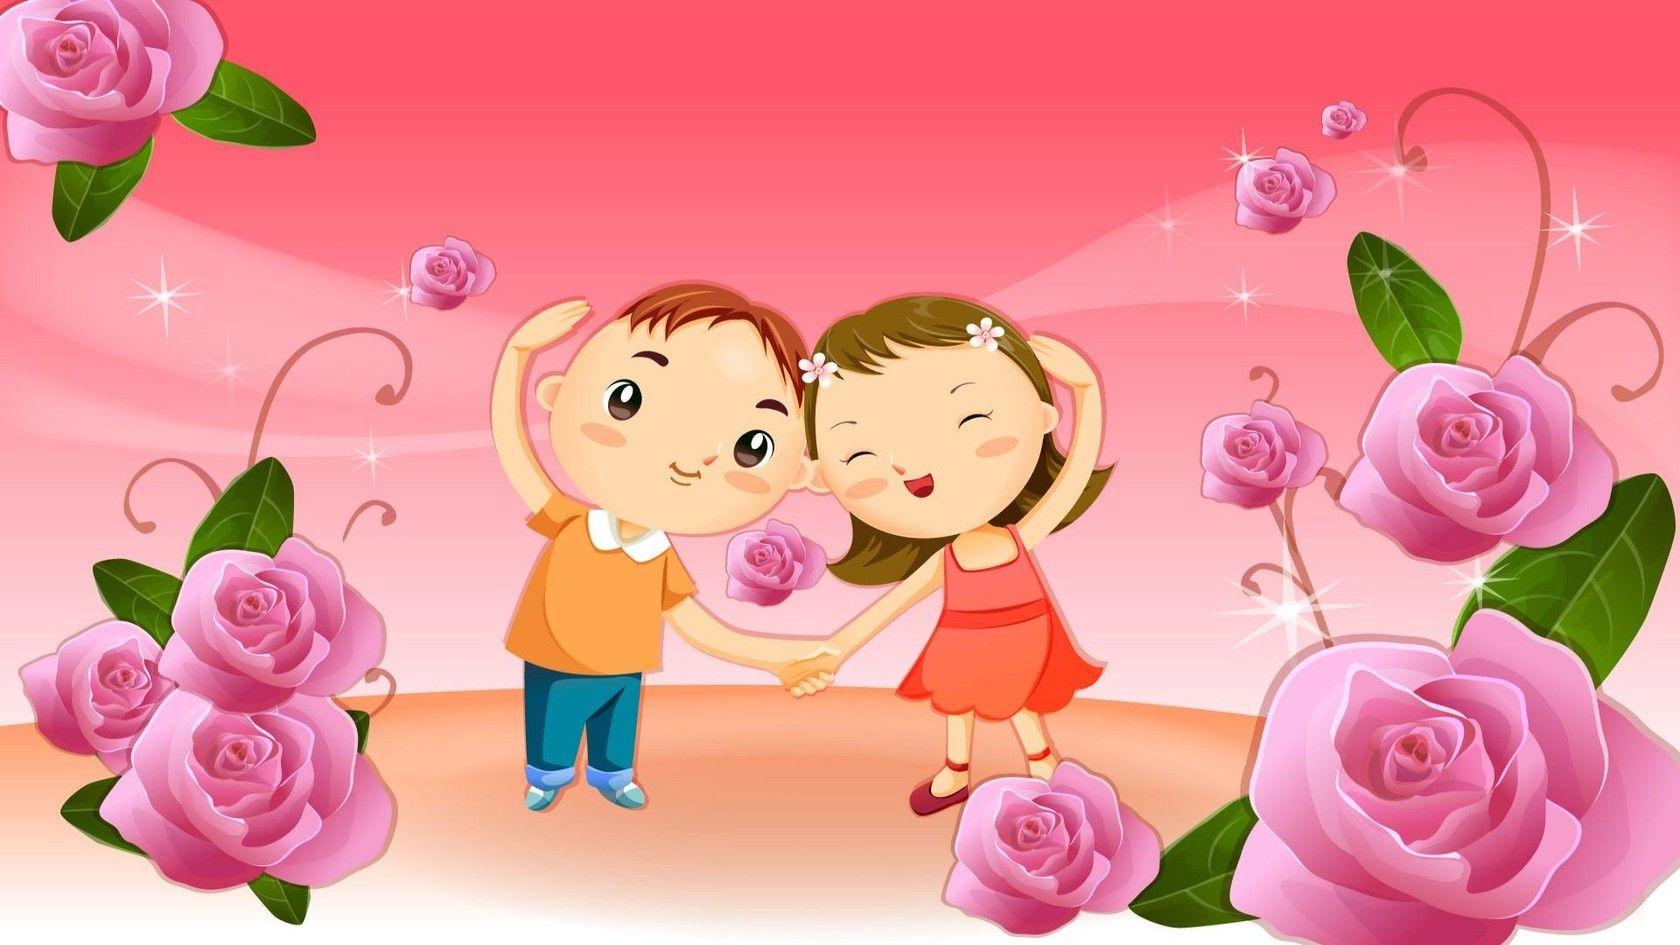 Vector Cartoon Couple In A Rose Garden Wallpaper Hd Imashon Com Friendship Day Wallpaper Happy Friendship Day Cute Cartoon Wallpapers Cute rose day couple hd wallpaper